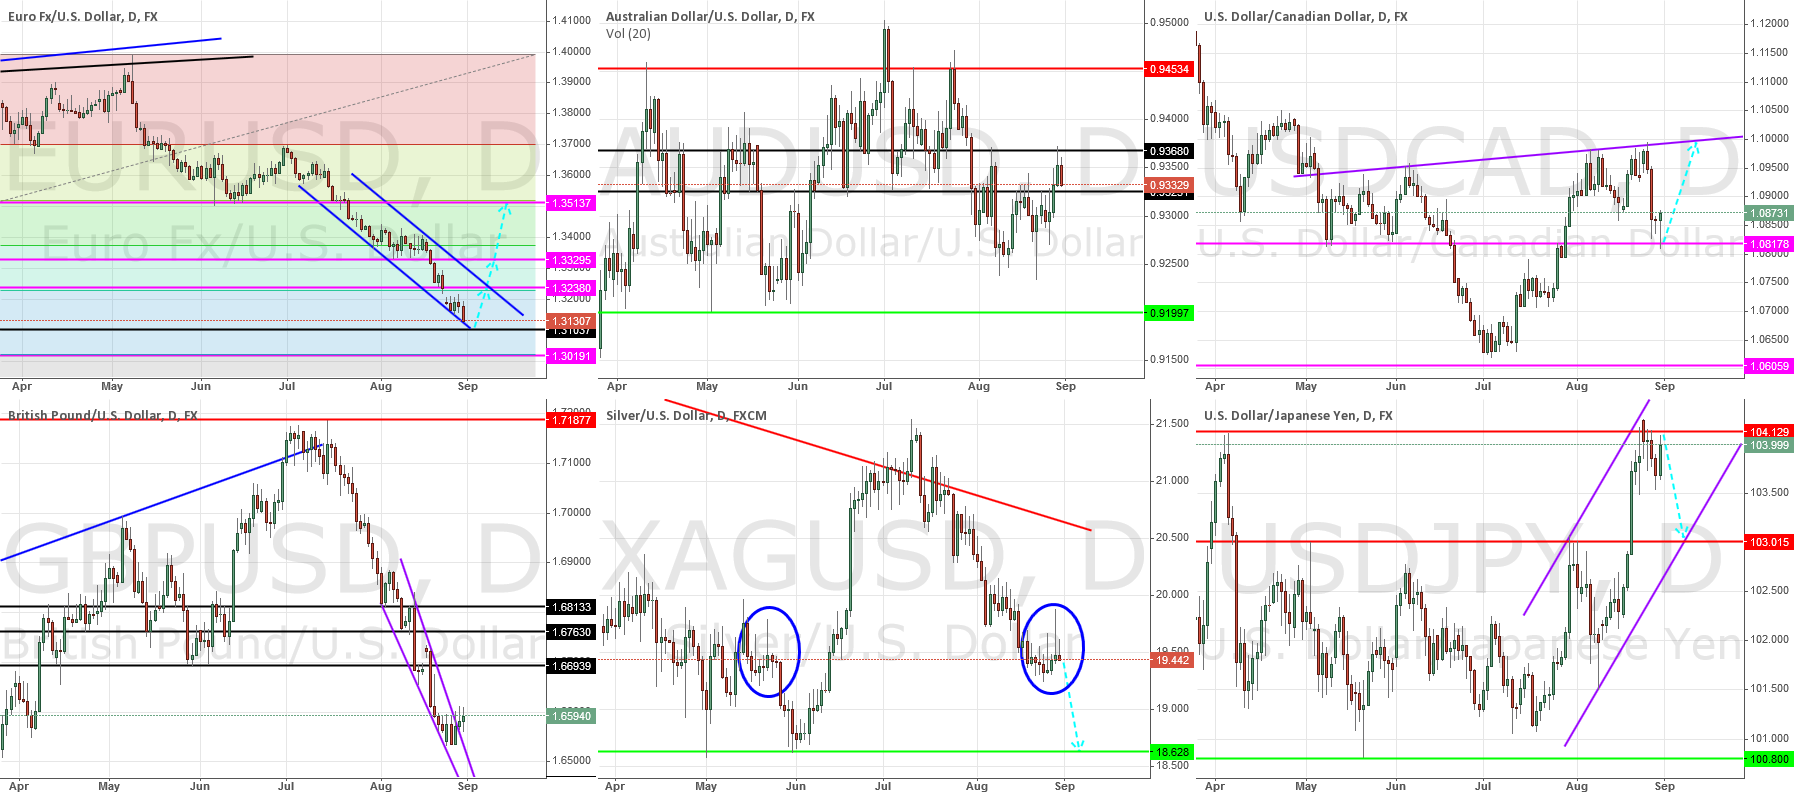 General Market Outlook - August 31st, 2014